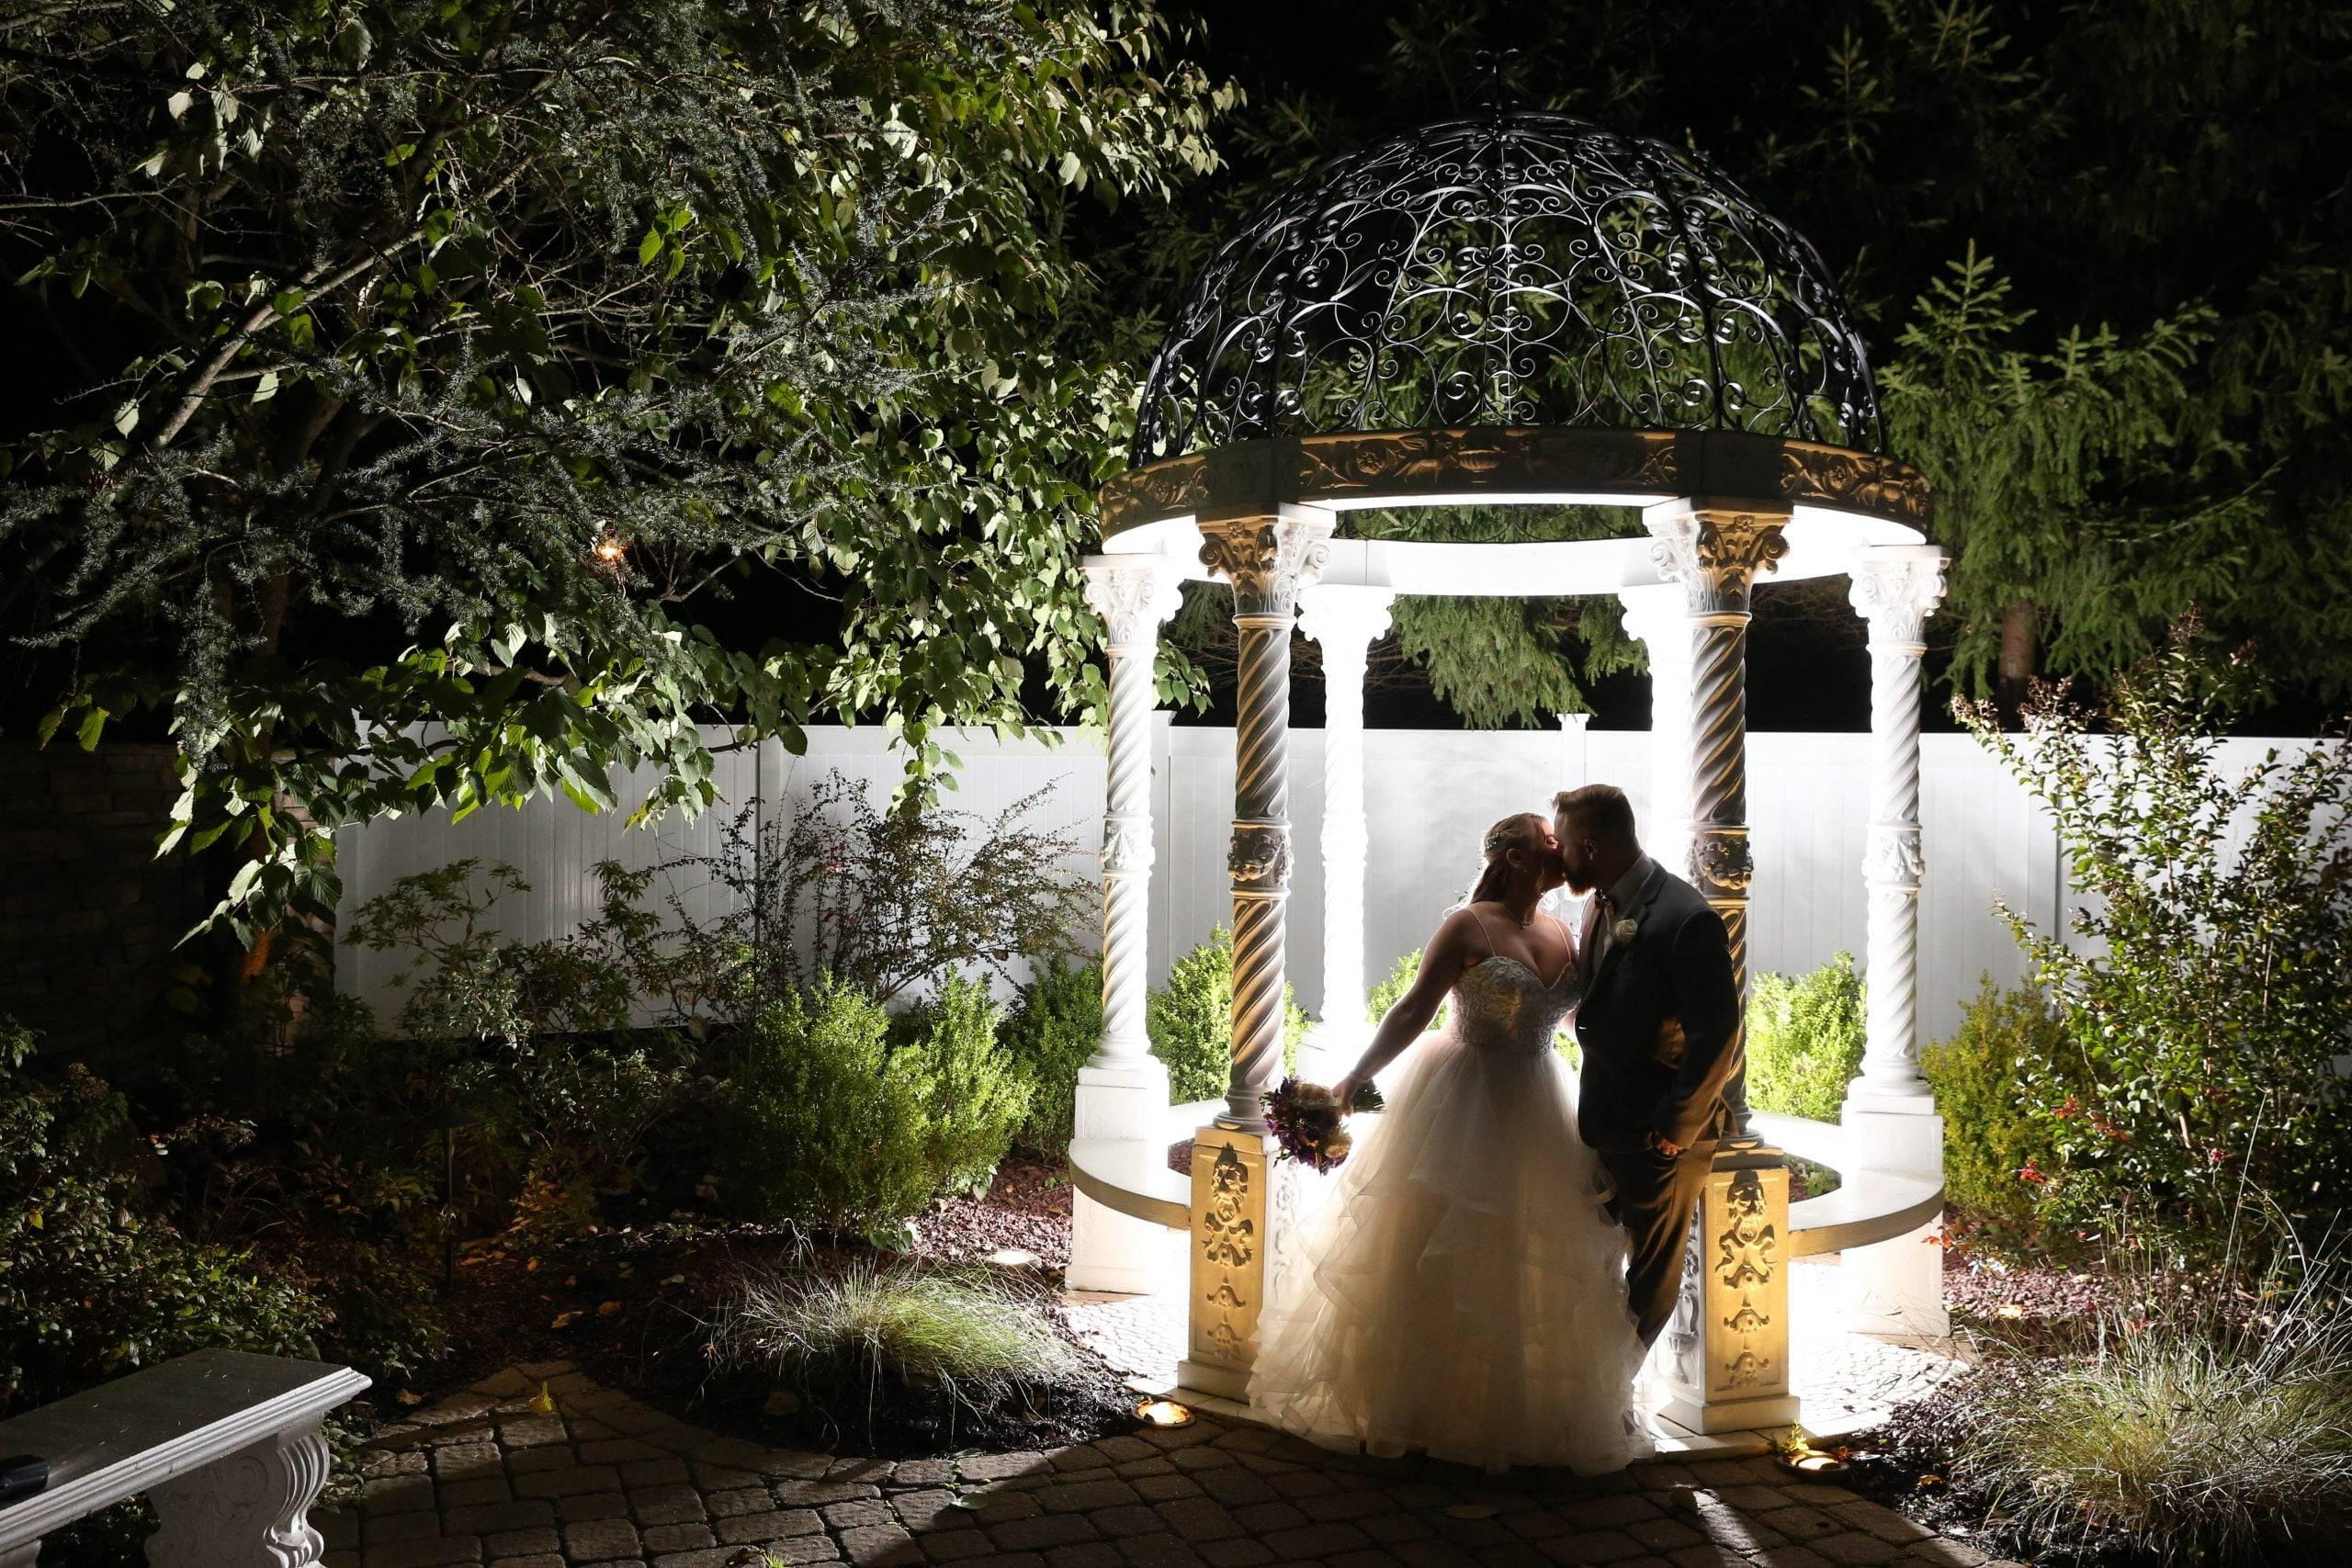 Primavera Regency bride and groom by lighted gazebo at night